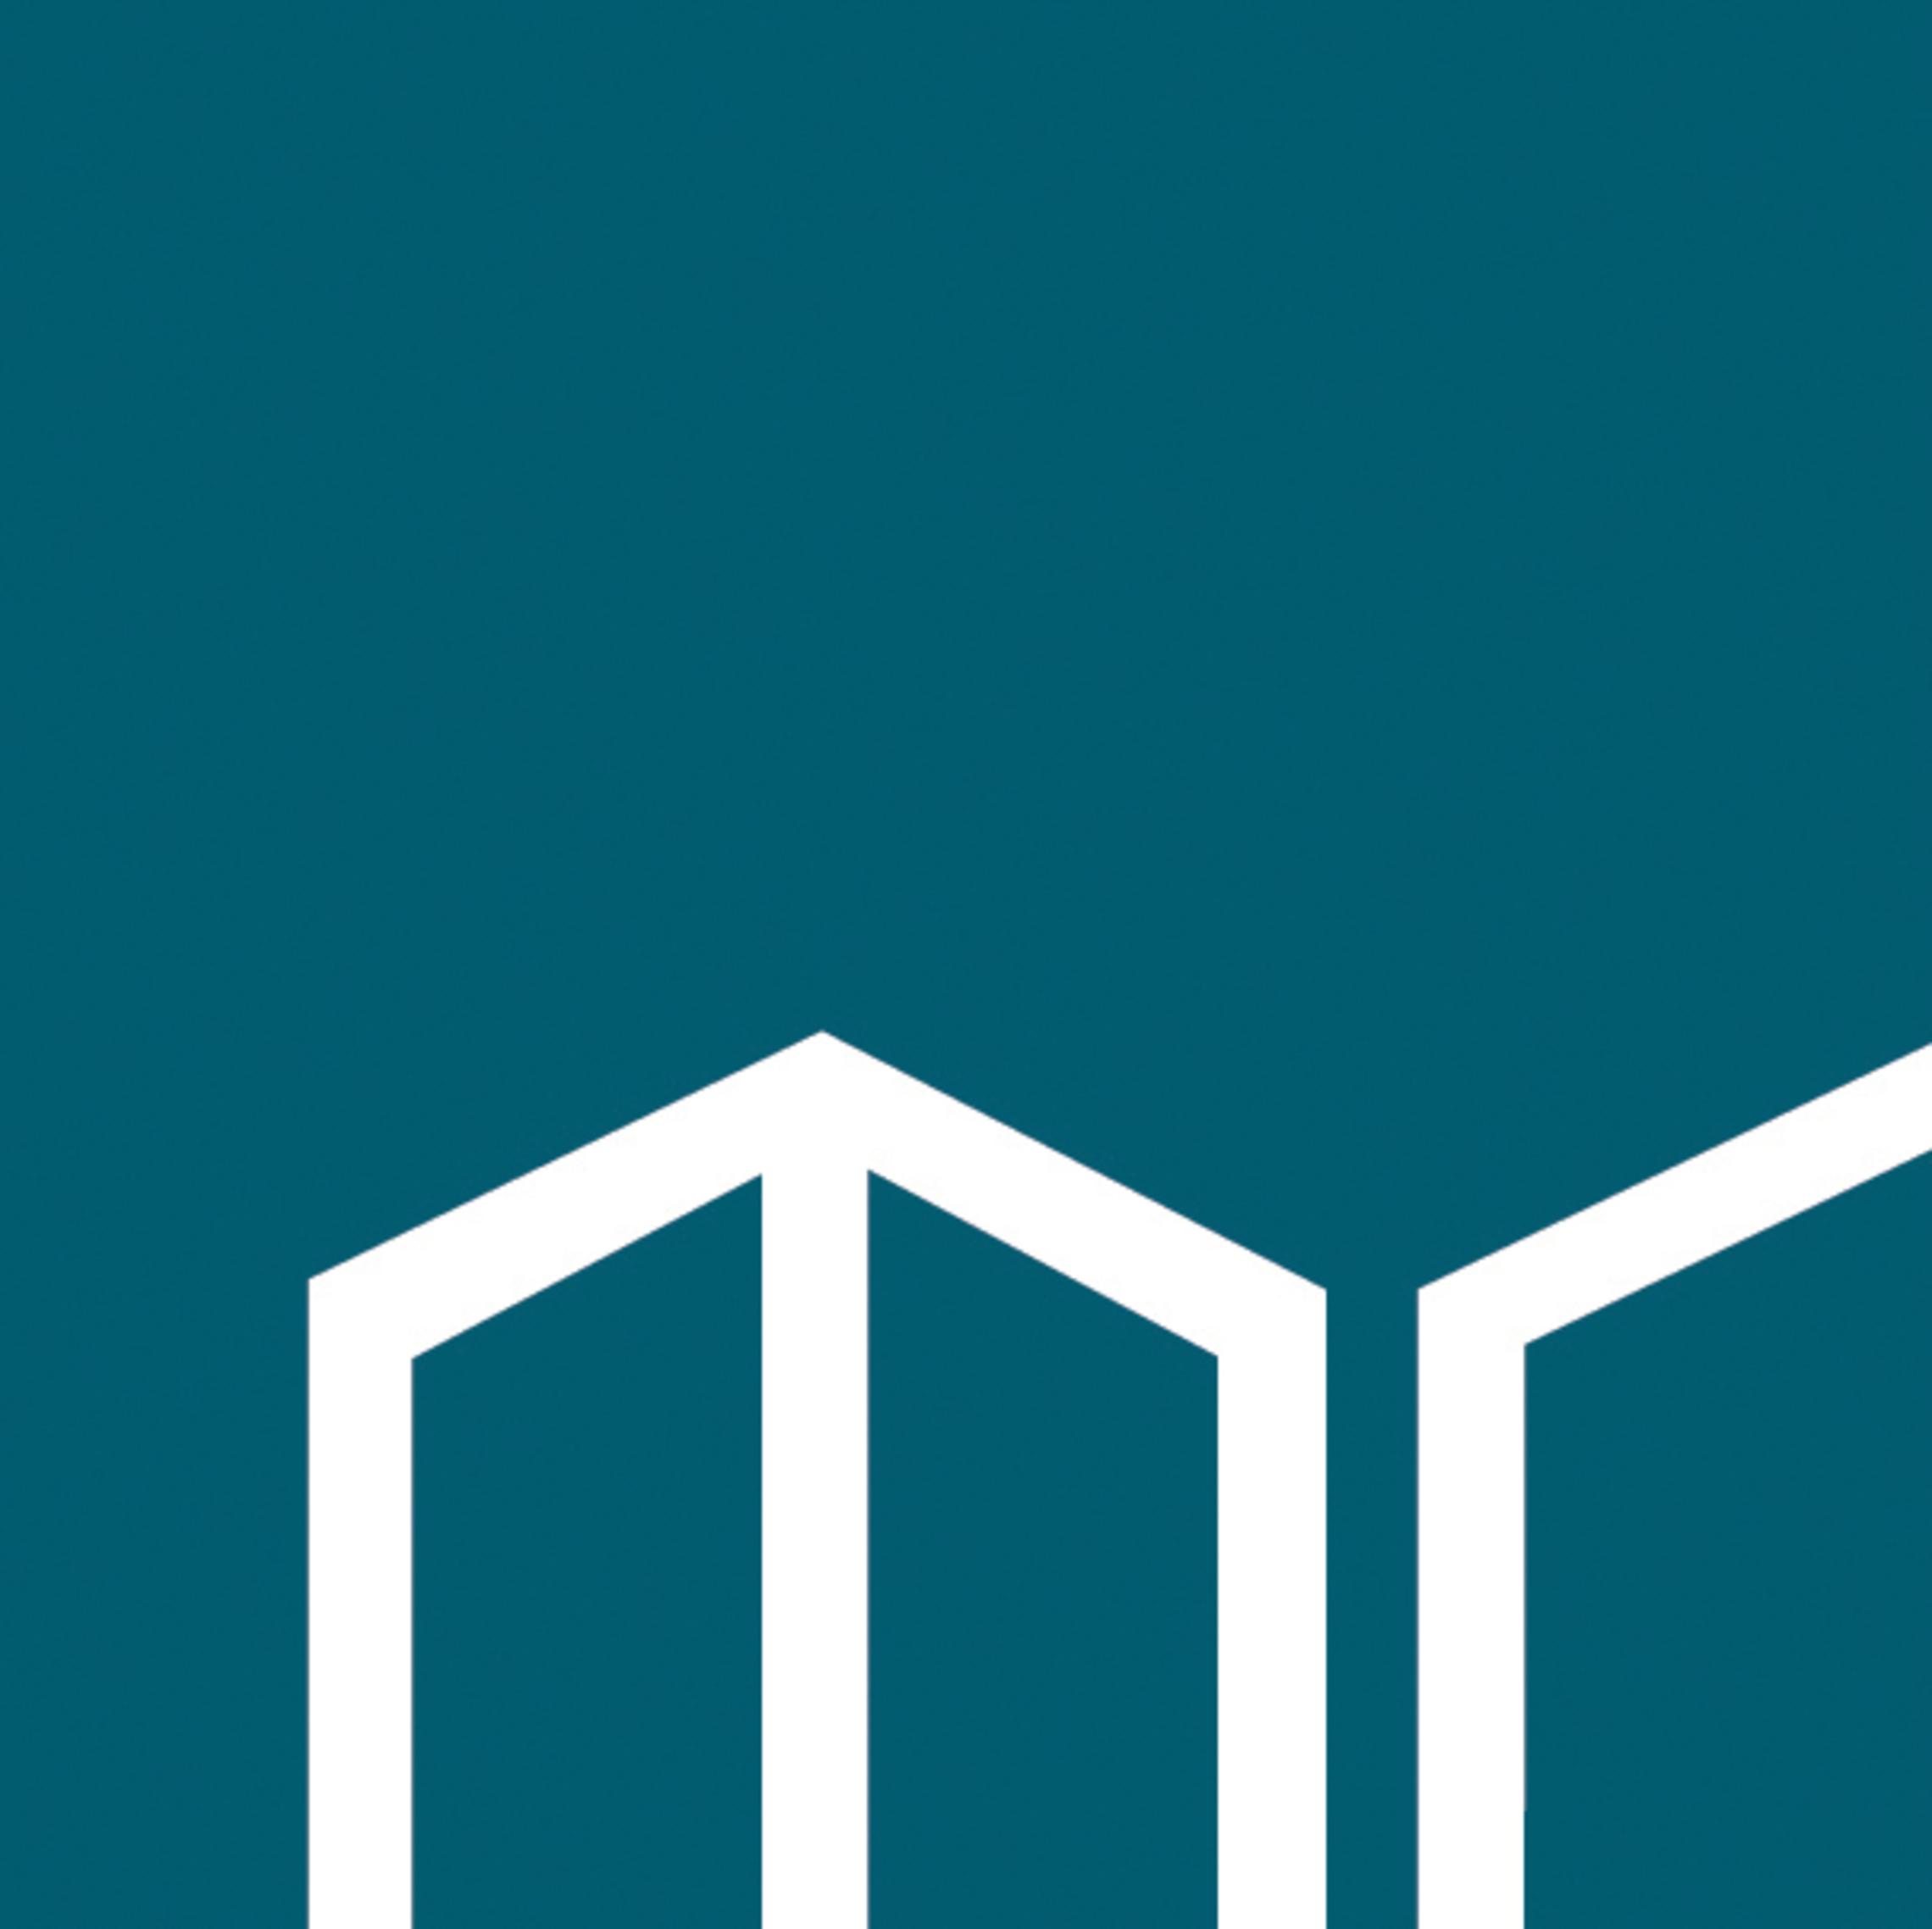 morton reeves estate- company logo